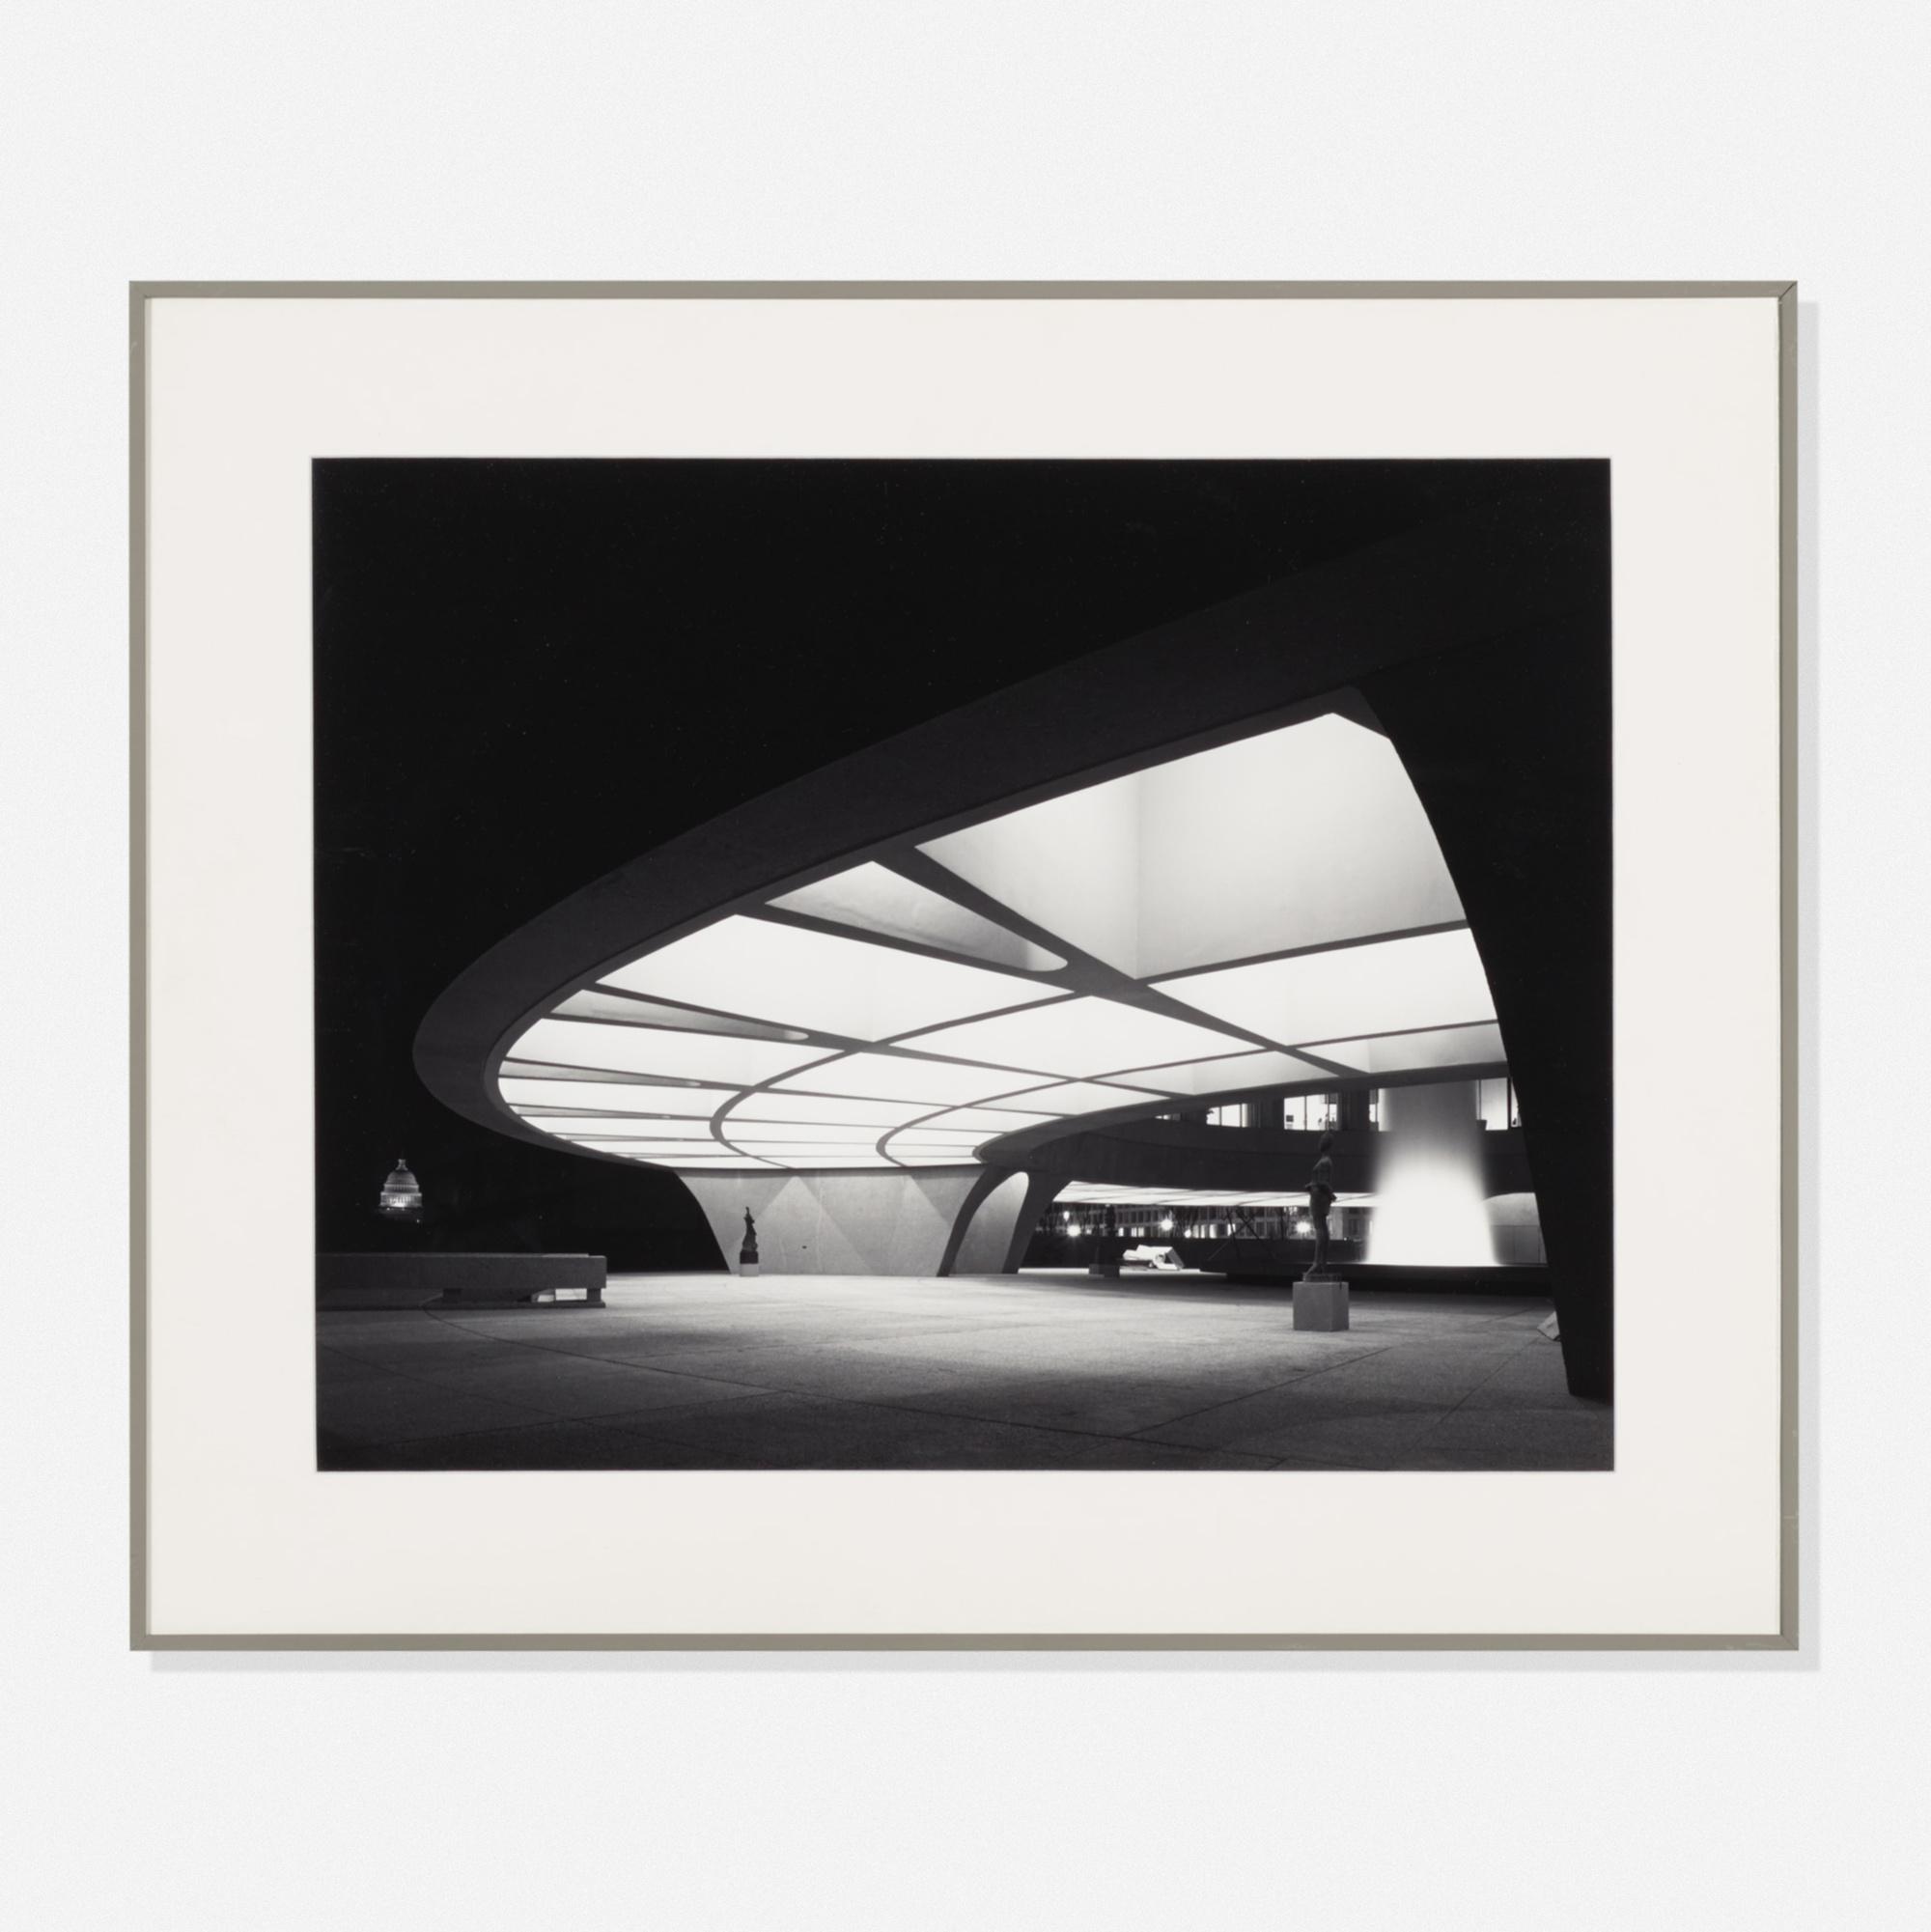 241: Ezra Stoller / Hirshhorn Museum, Washington, DC Arch: SOM (1 of 1)